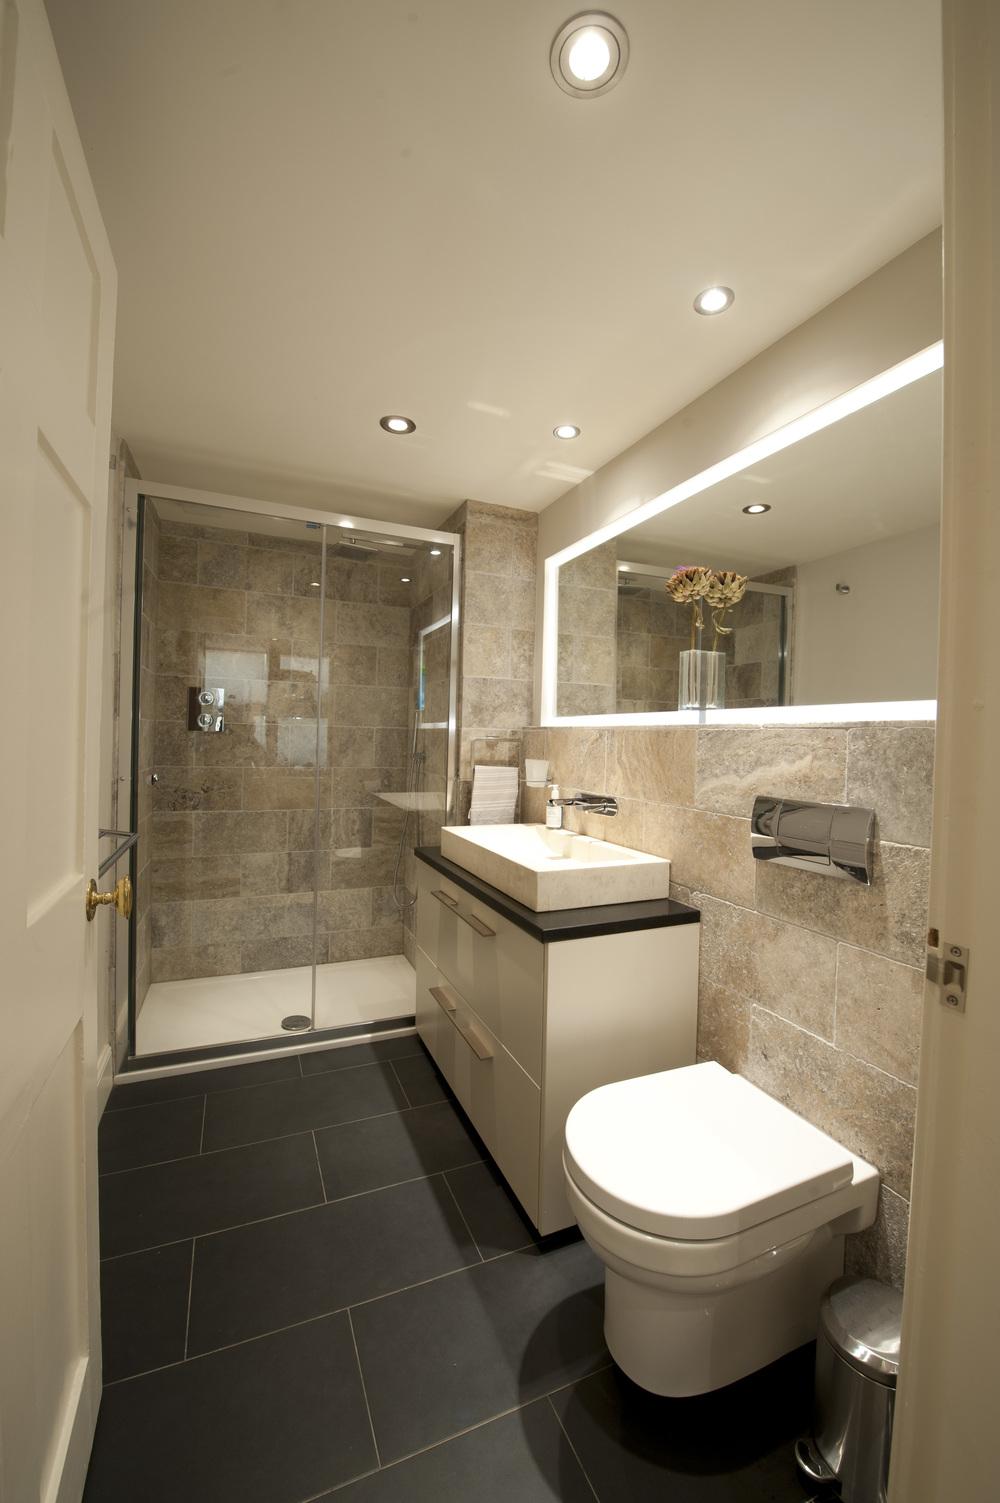 Bathroom_34 Regent St 23.jpg